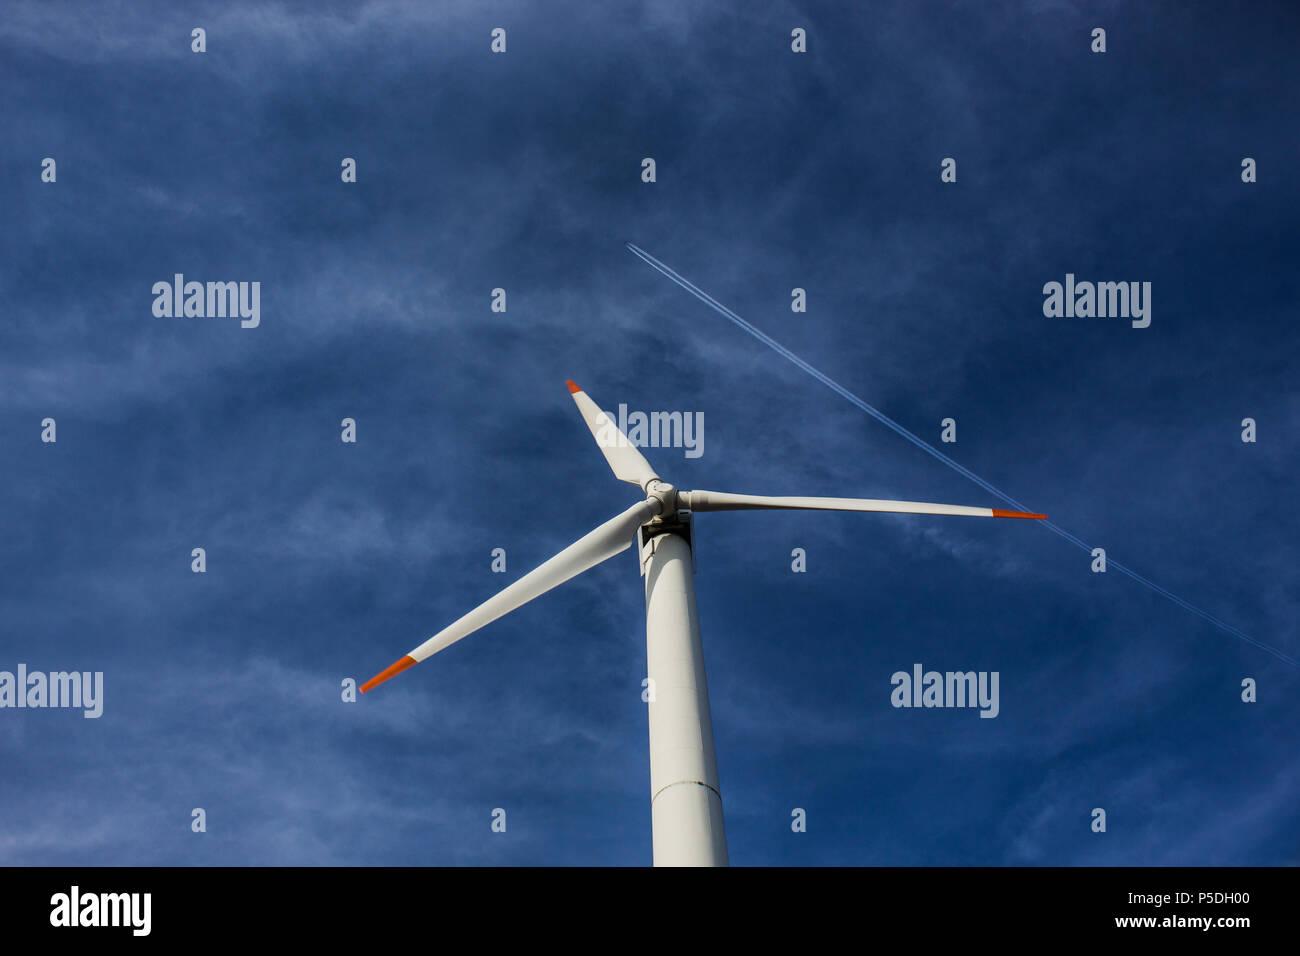 Renewable Energy Vs. Fossil Fuel. Contrast contrast between fossil fuel energy and wind energy. - Stock Image